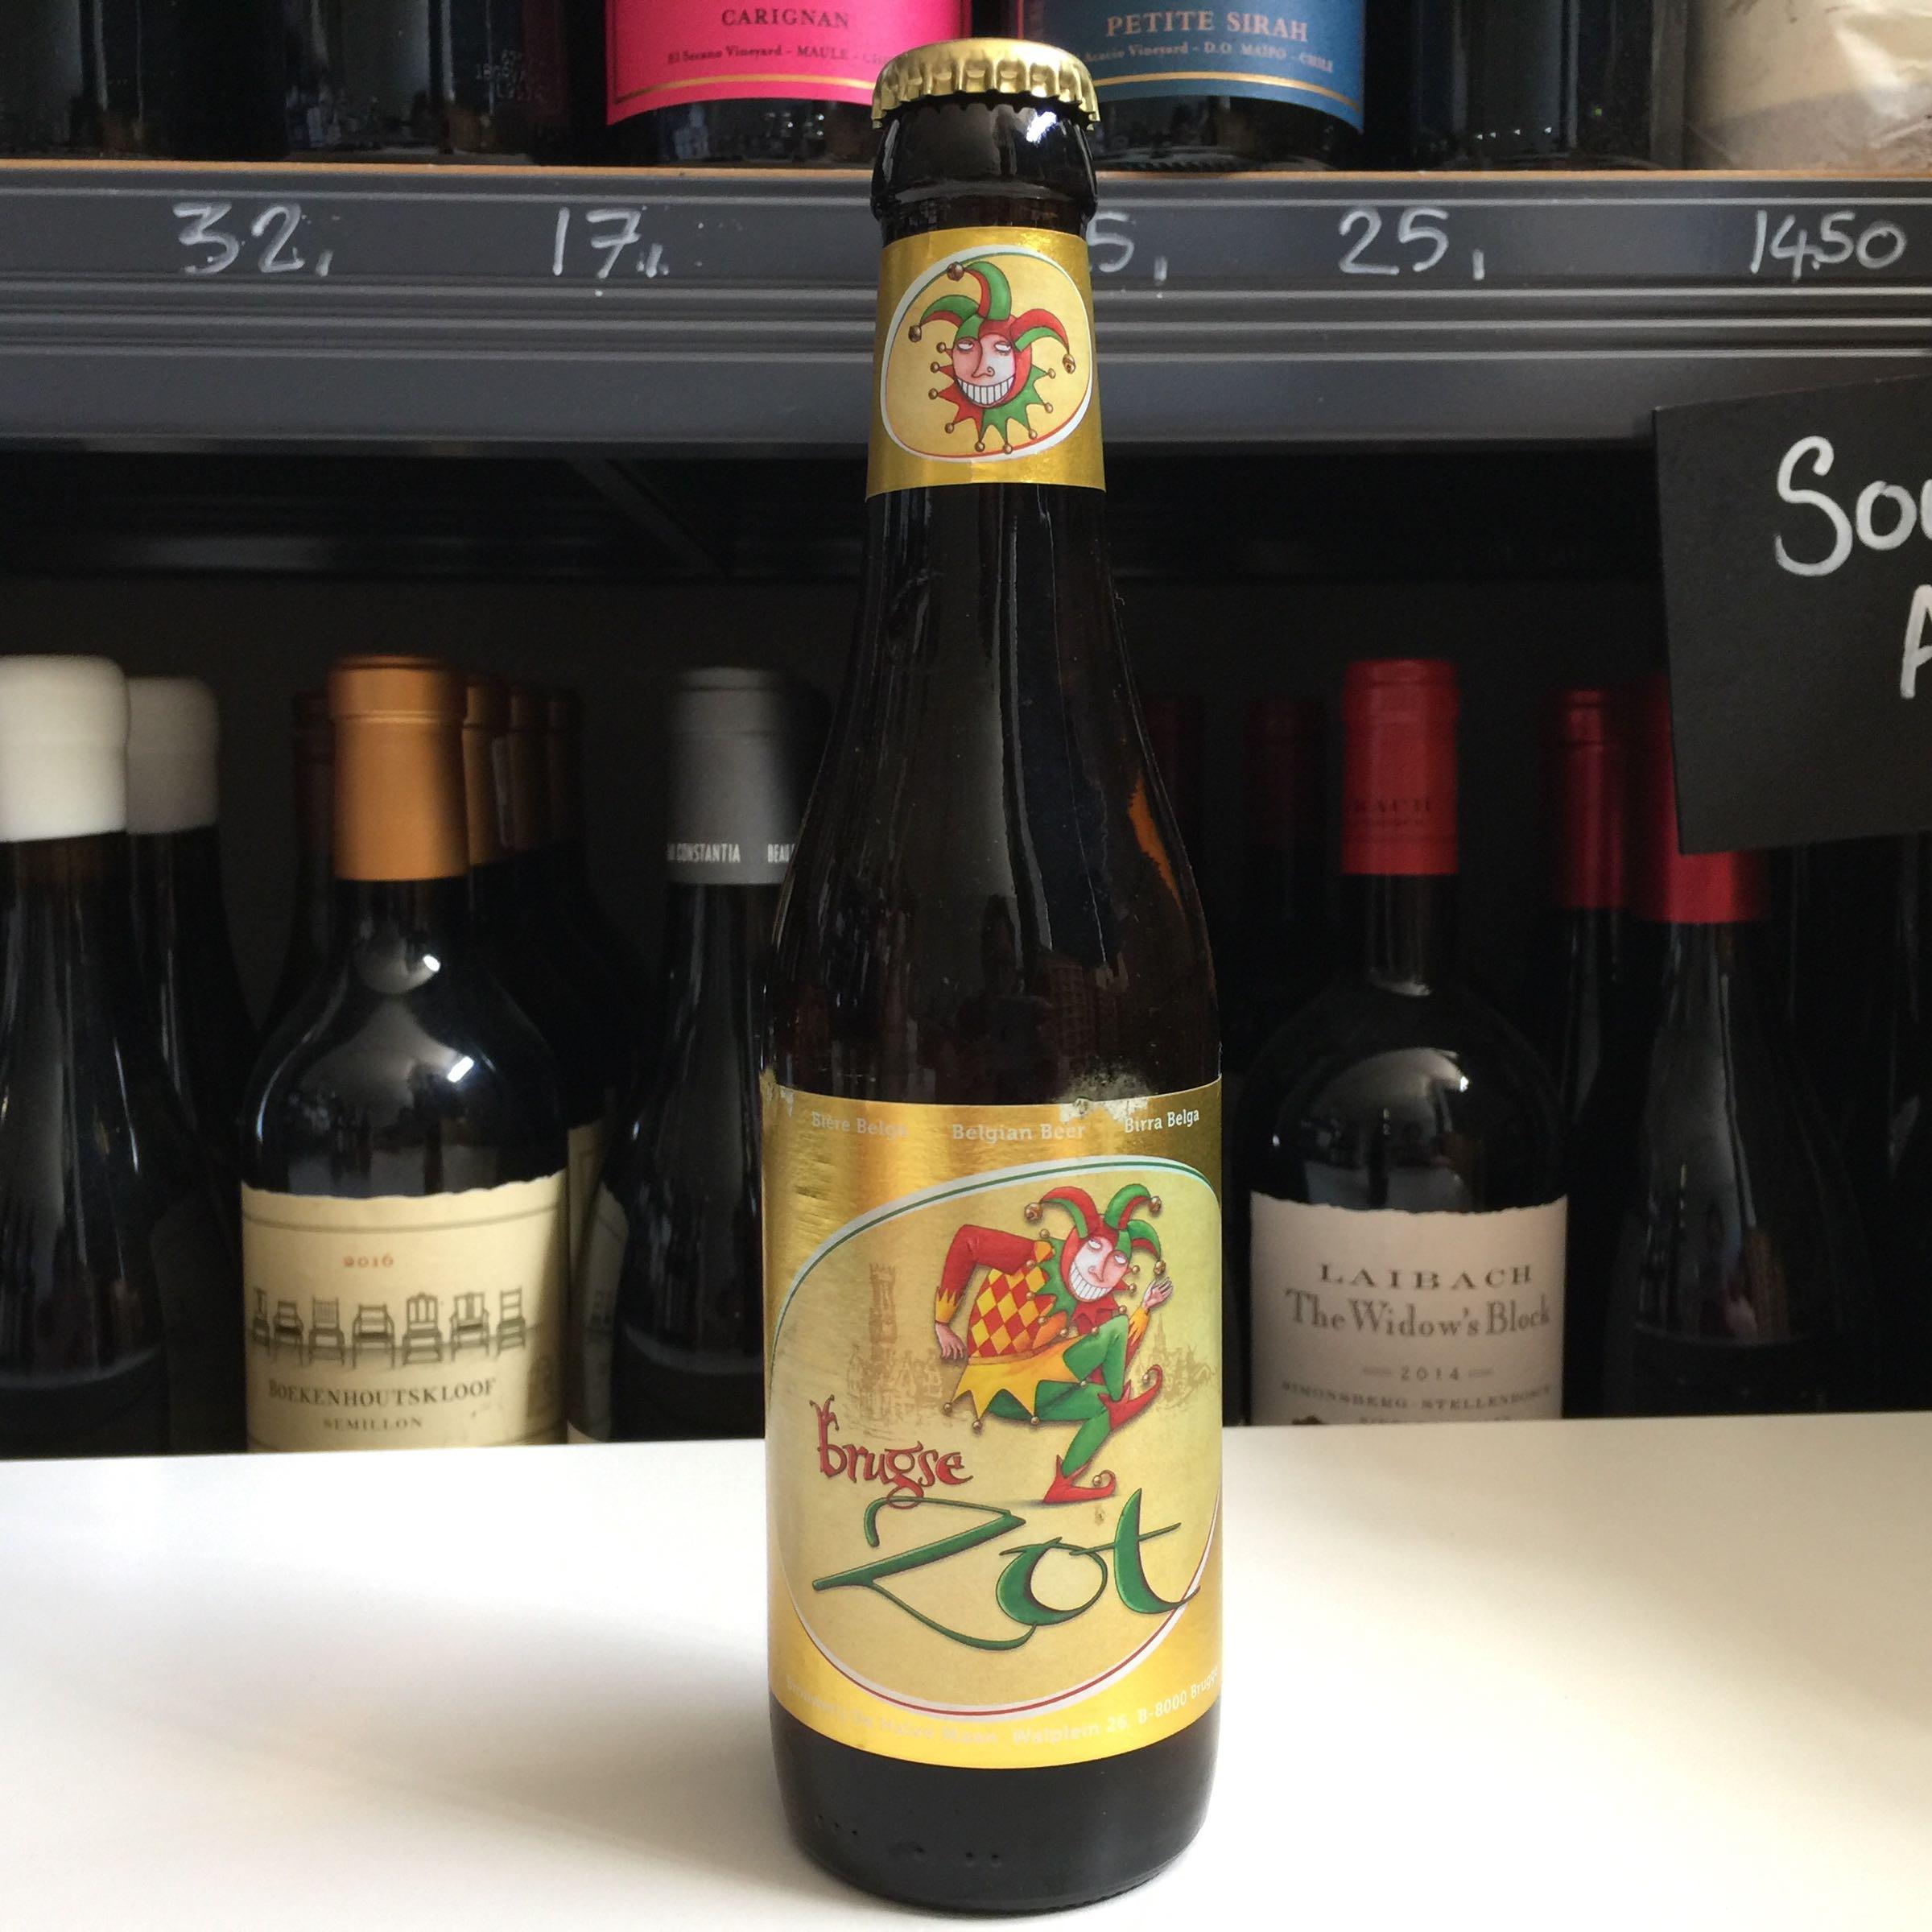 Brugse Zot Blond ' Belgium Blond Beer' 33cl 6.0% ABV